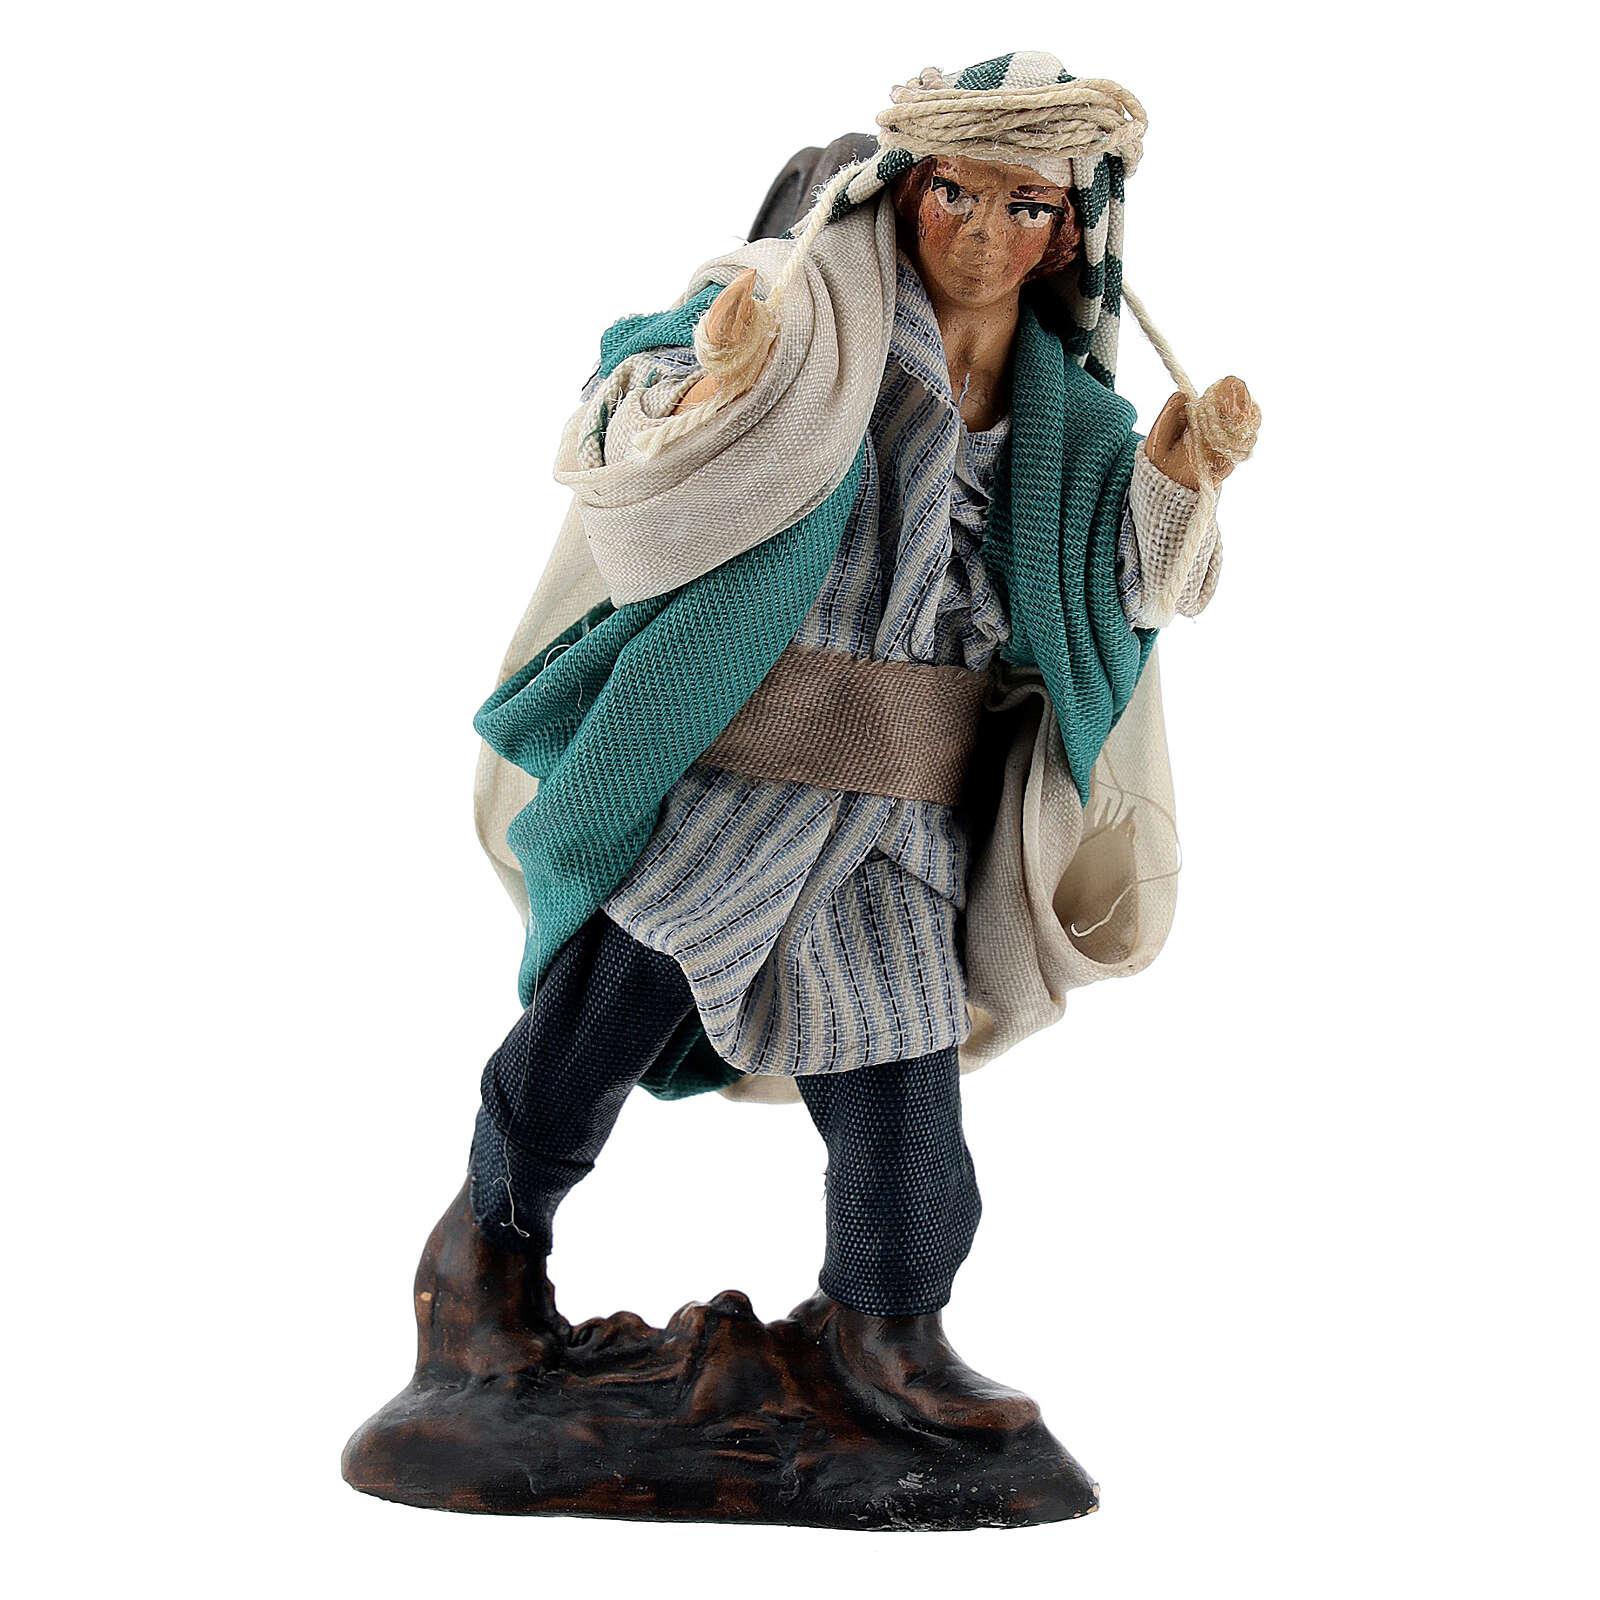 Pastor barriles en los hombros terracota belén napolitano 8 cm 4